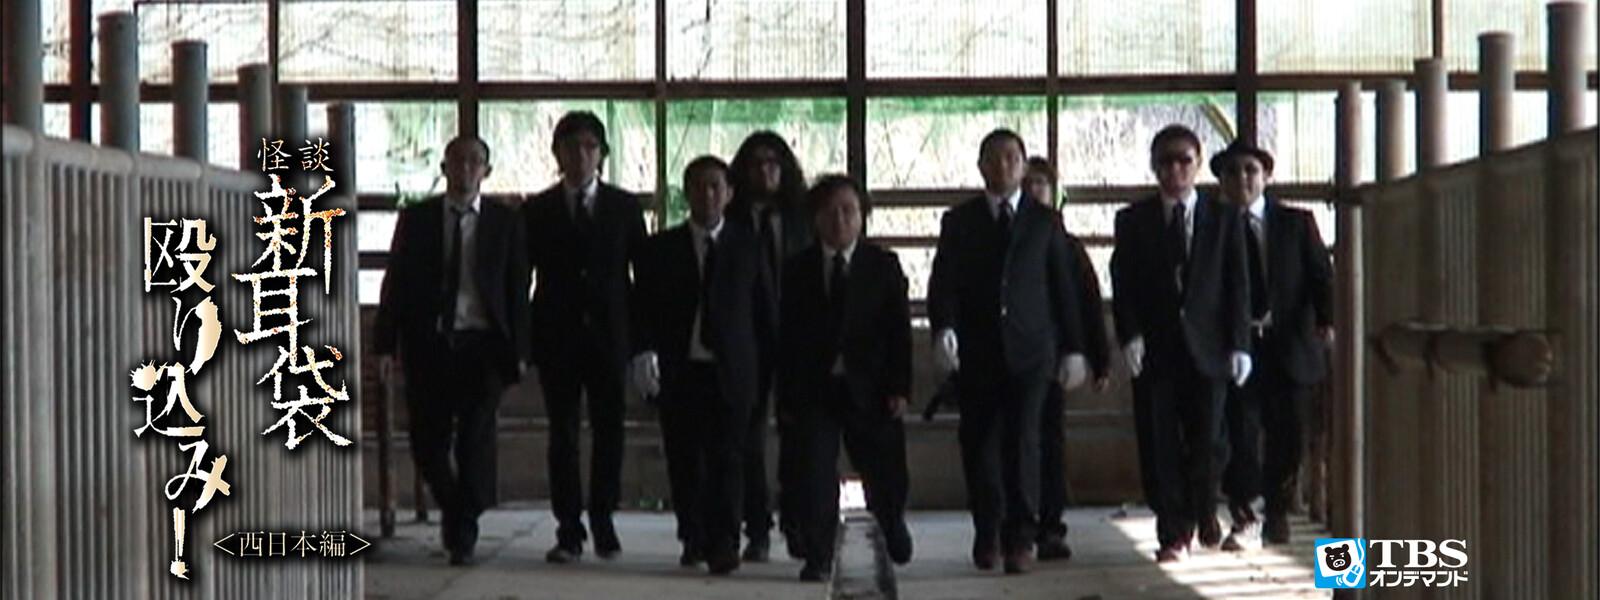 怪談新耳袋 殴り込み! 西日本編の動画 - 怪談新耳袋Gメン復活編